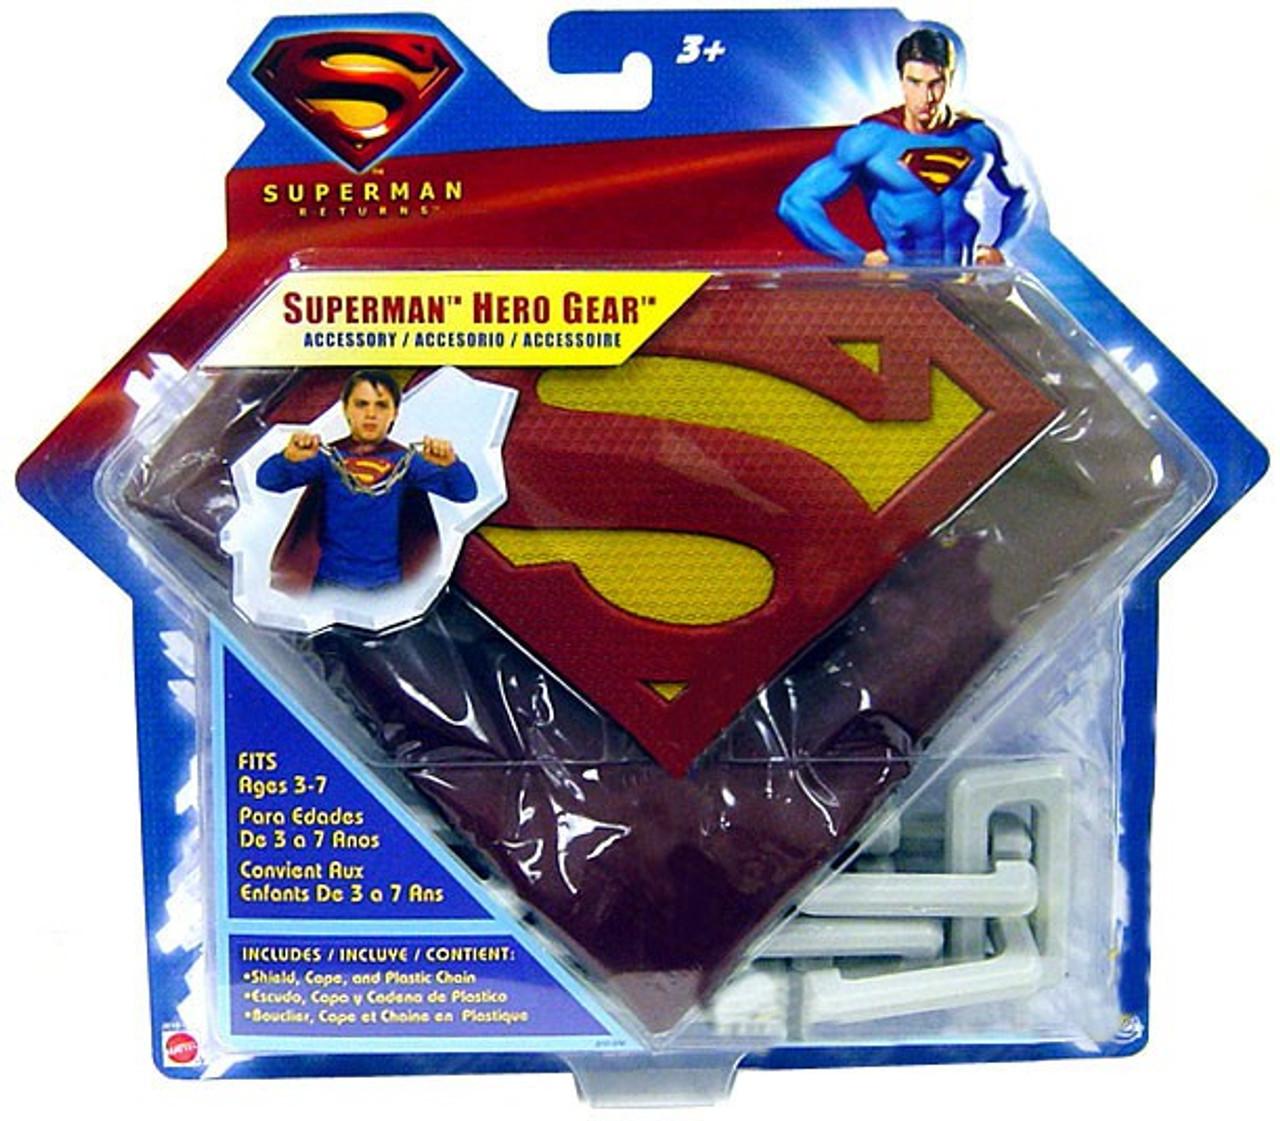 Superman Returns Superman Hero Gear Roleplay Toy